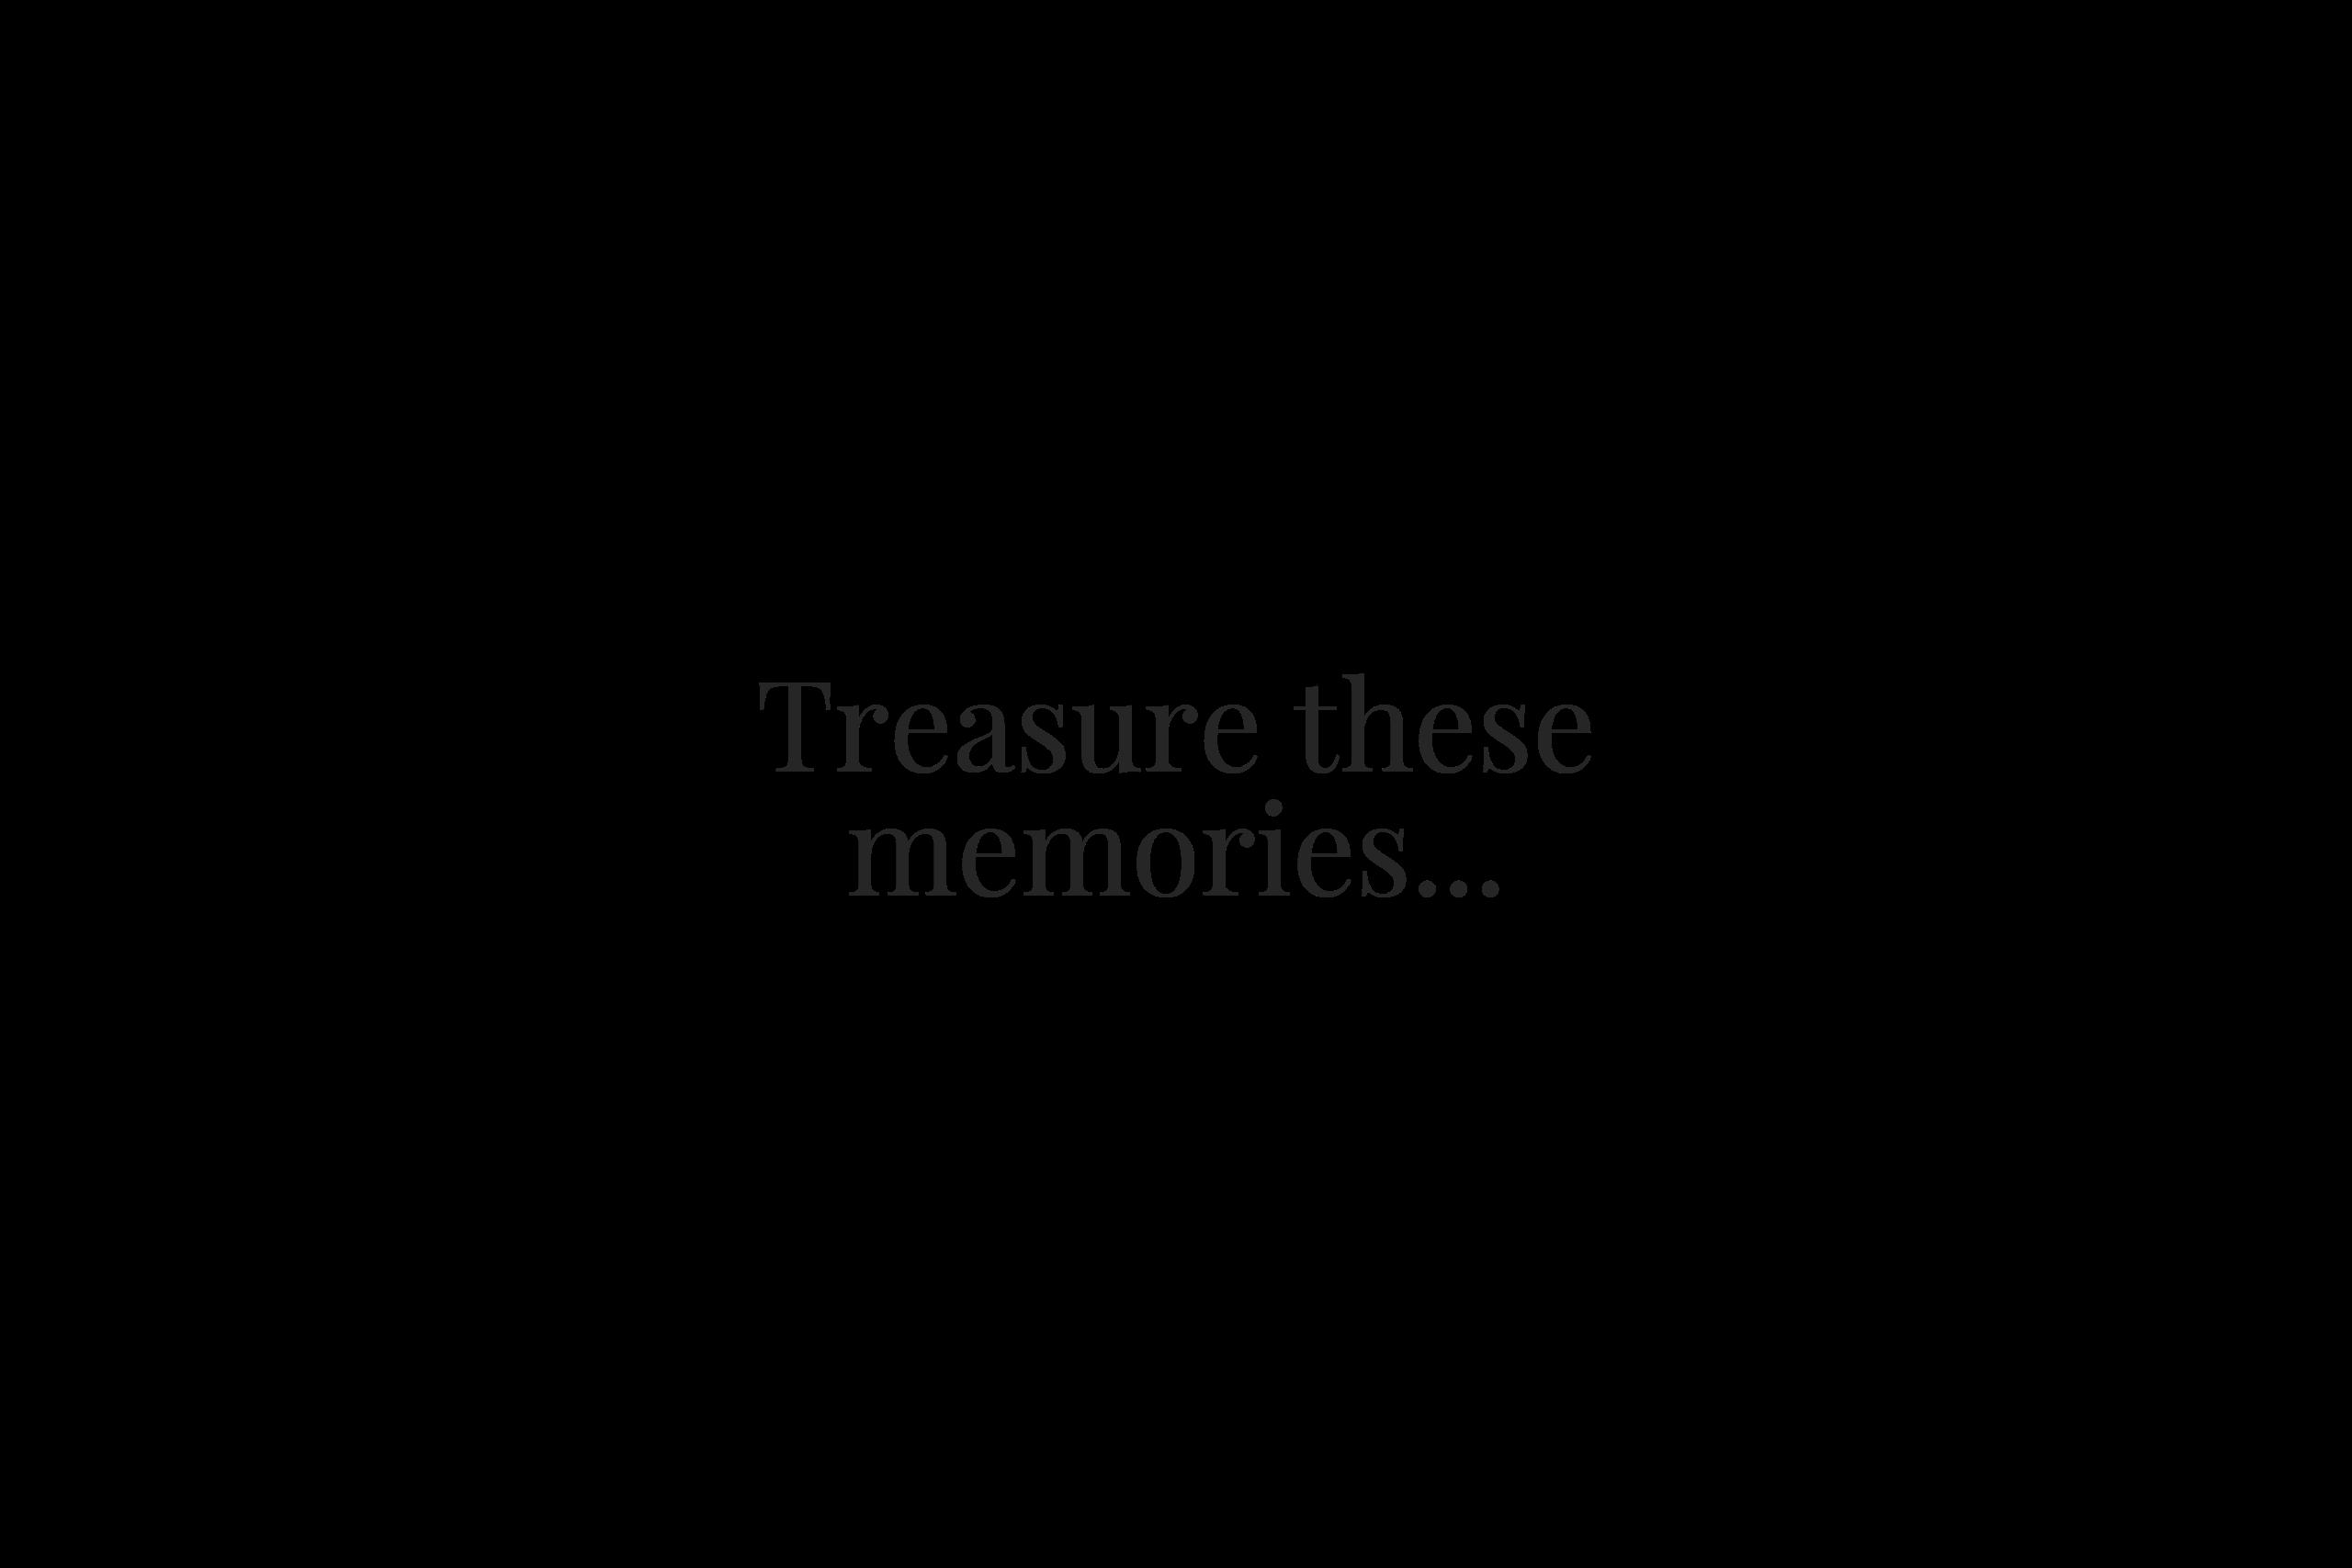 Treasure These Memories - Video Tributes